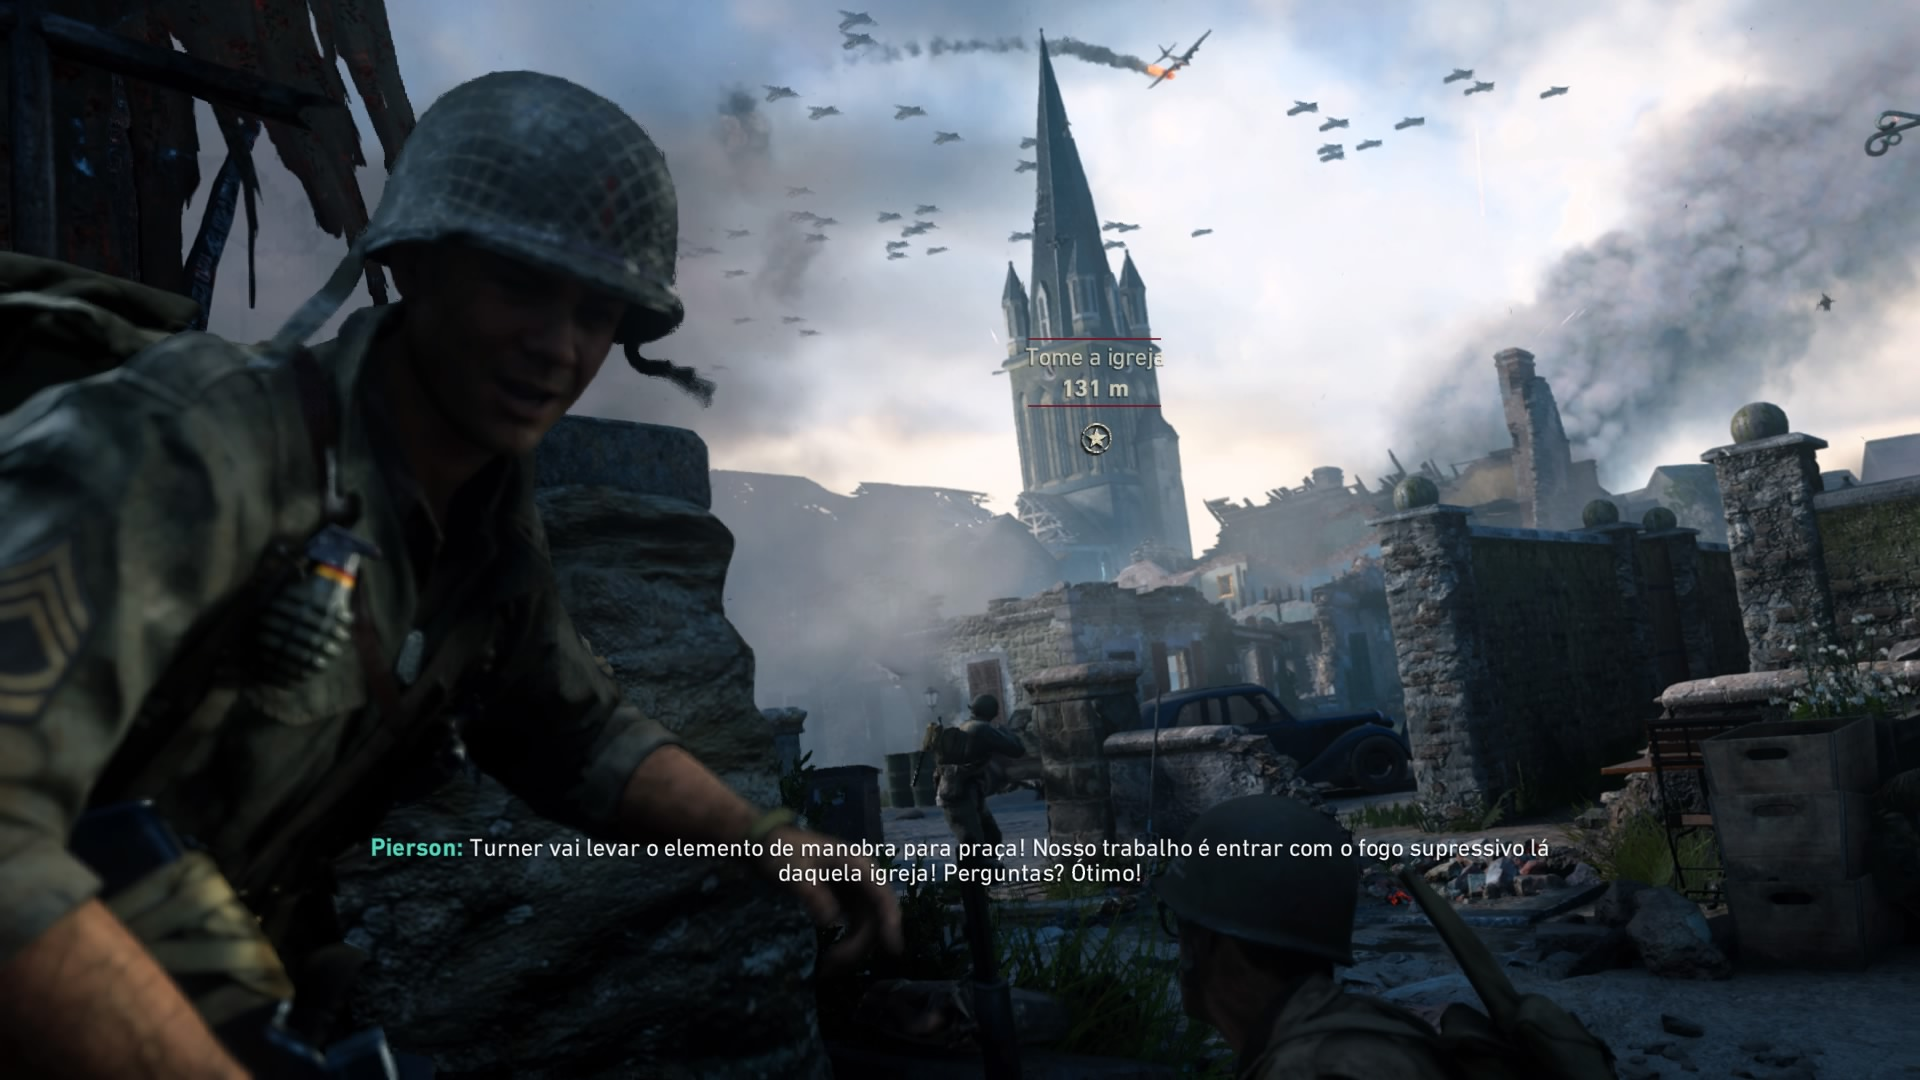 Episódio 15 Especial E3 2018 – O que a Sony/Playstation vai apresentar?